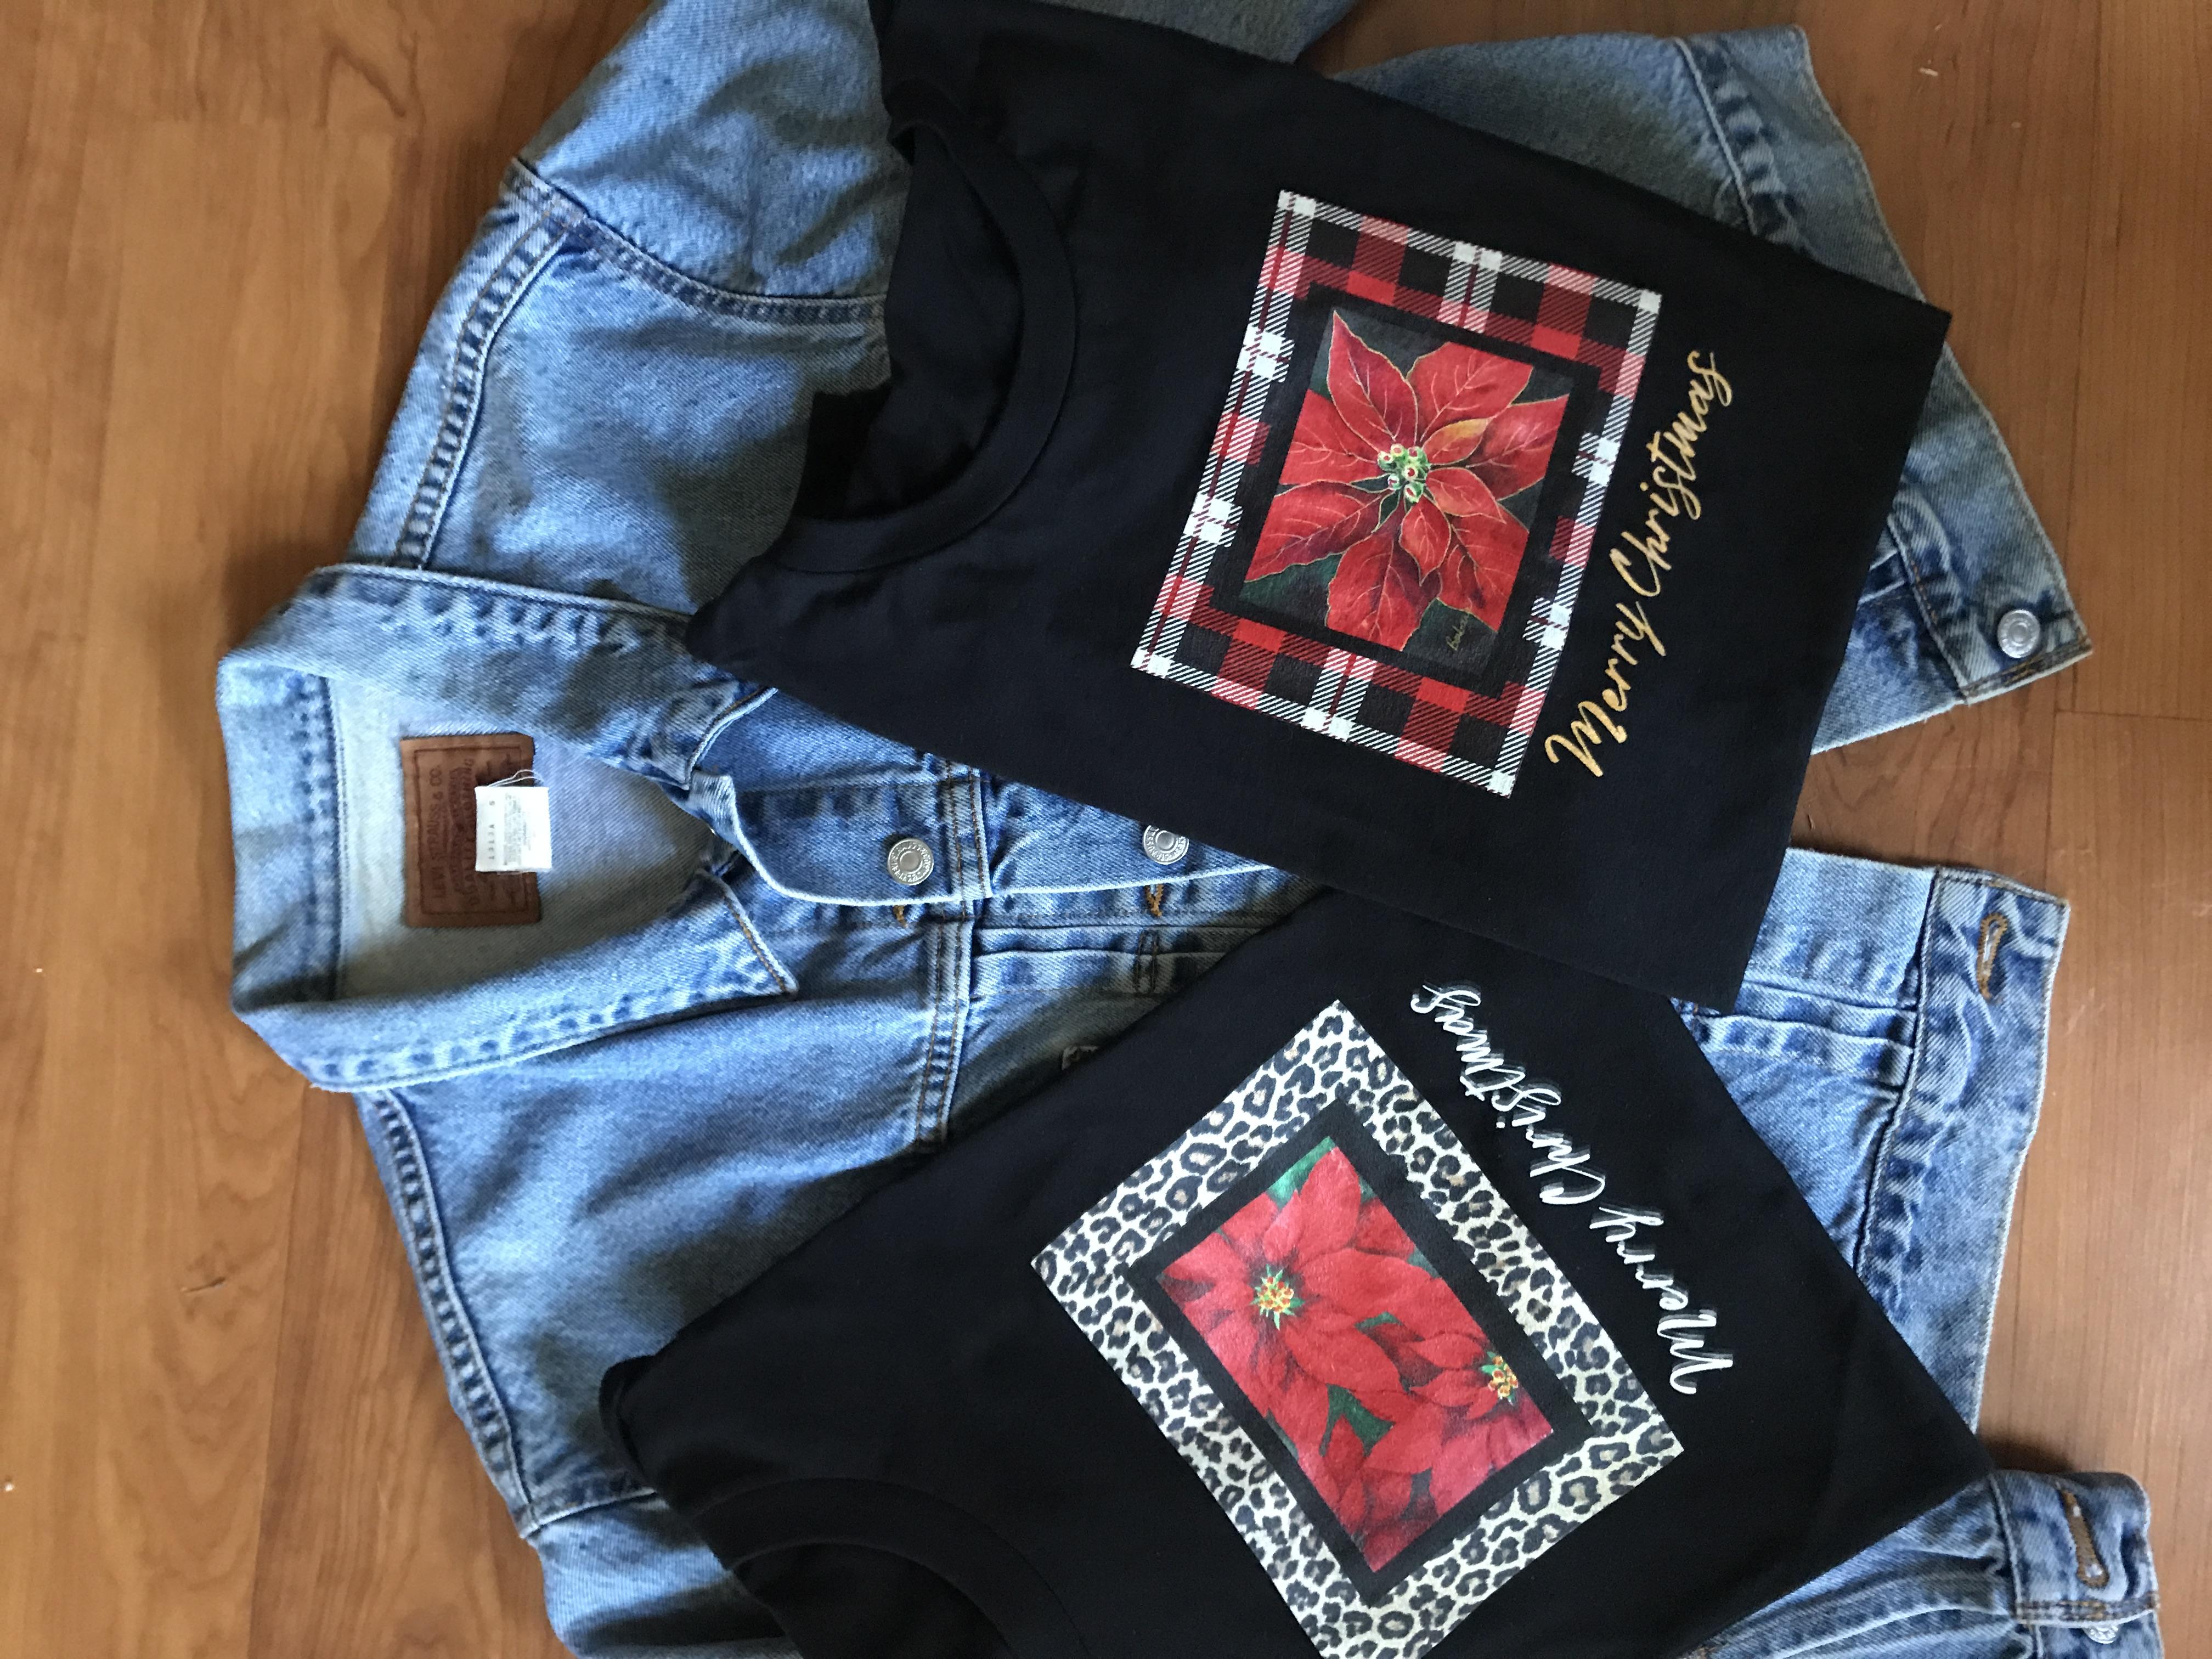 poinsettia shirts